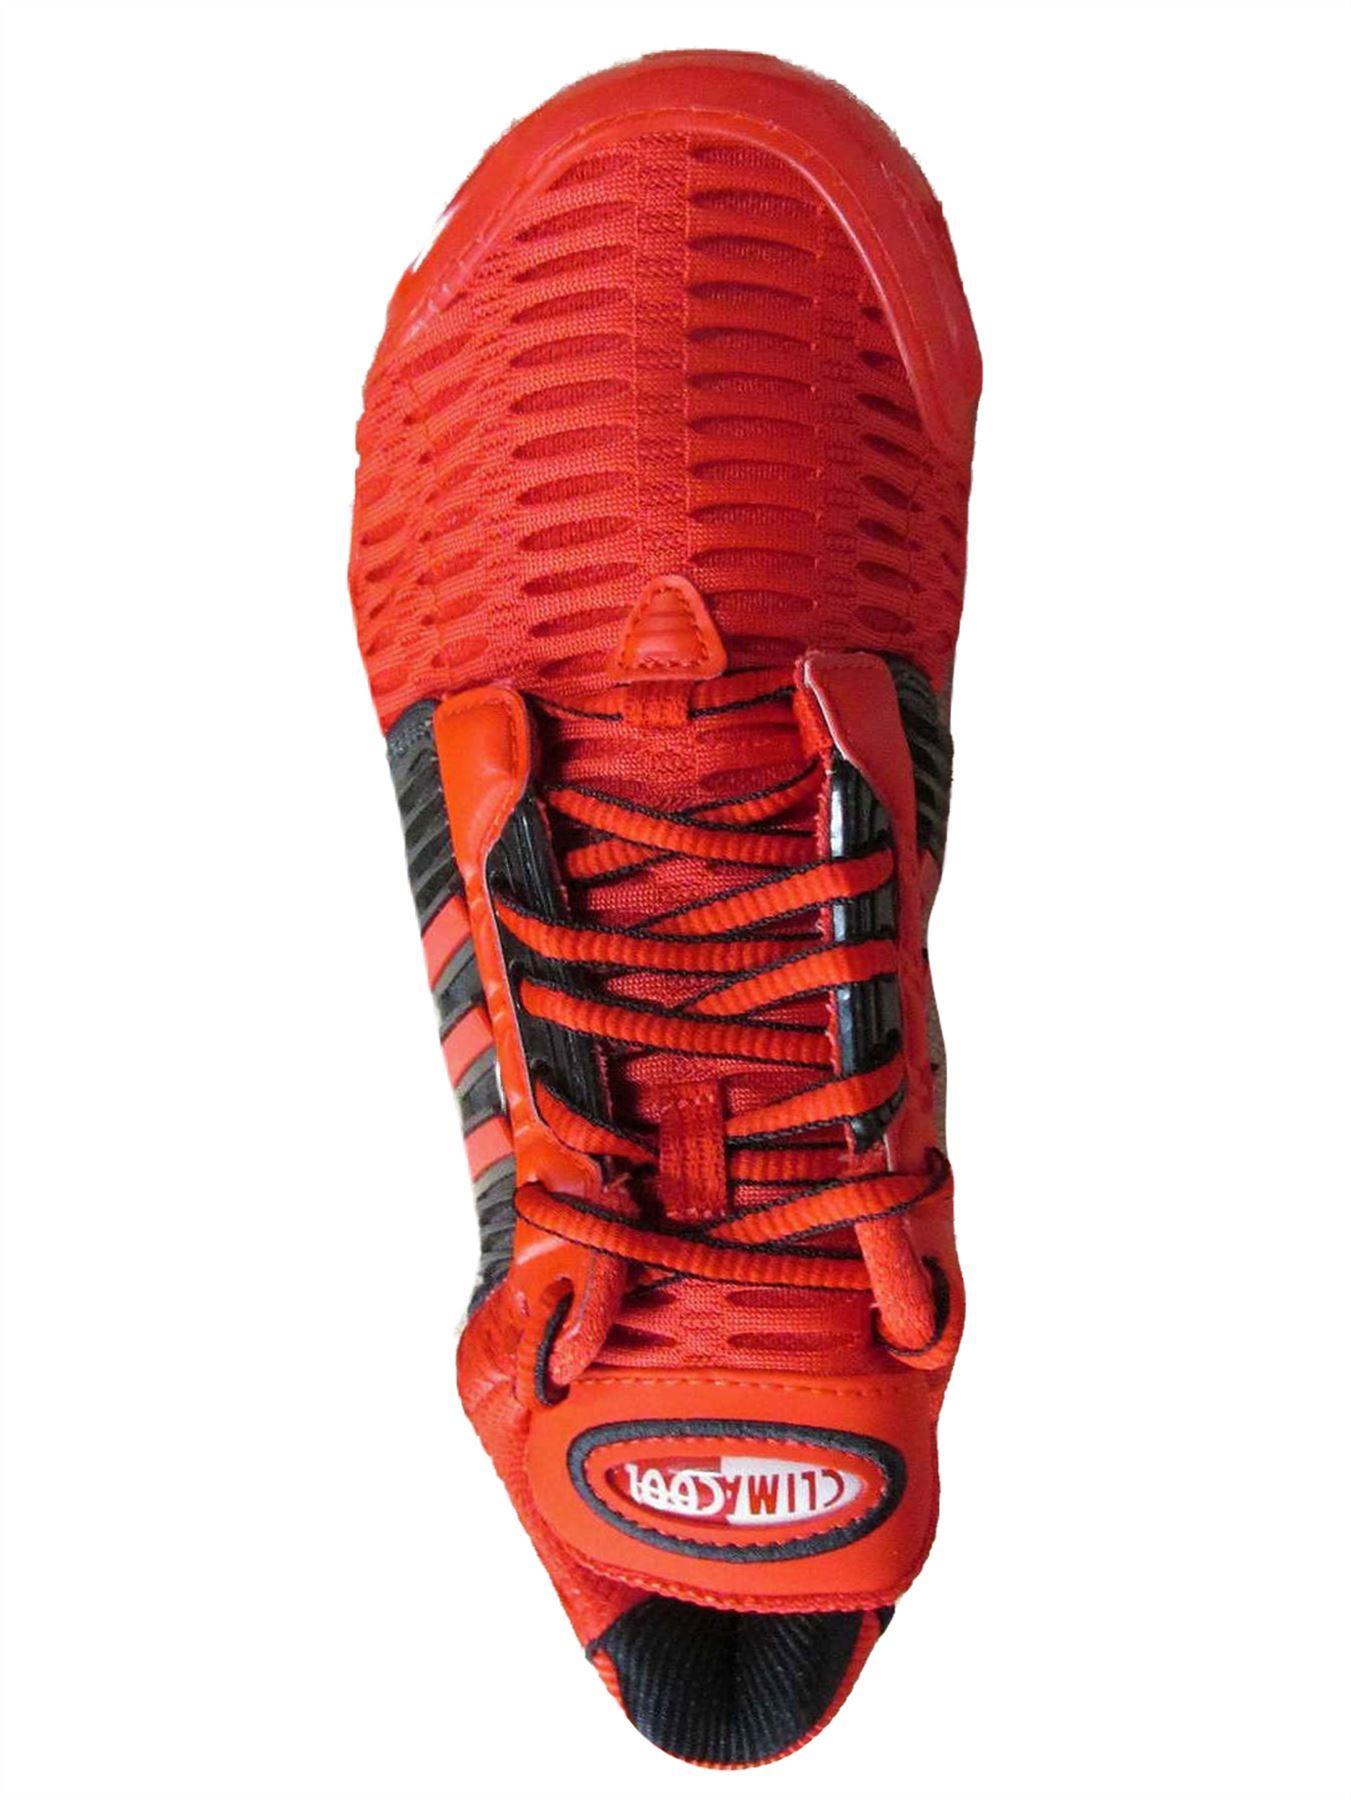 adidas-Climacool-1-Mens-Trainers-Originals-UK-3-5-to-13-5-Unisex-9-Colours